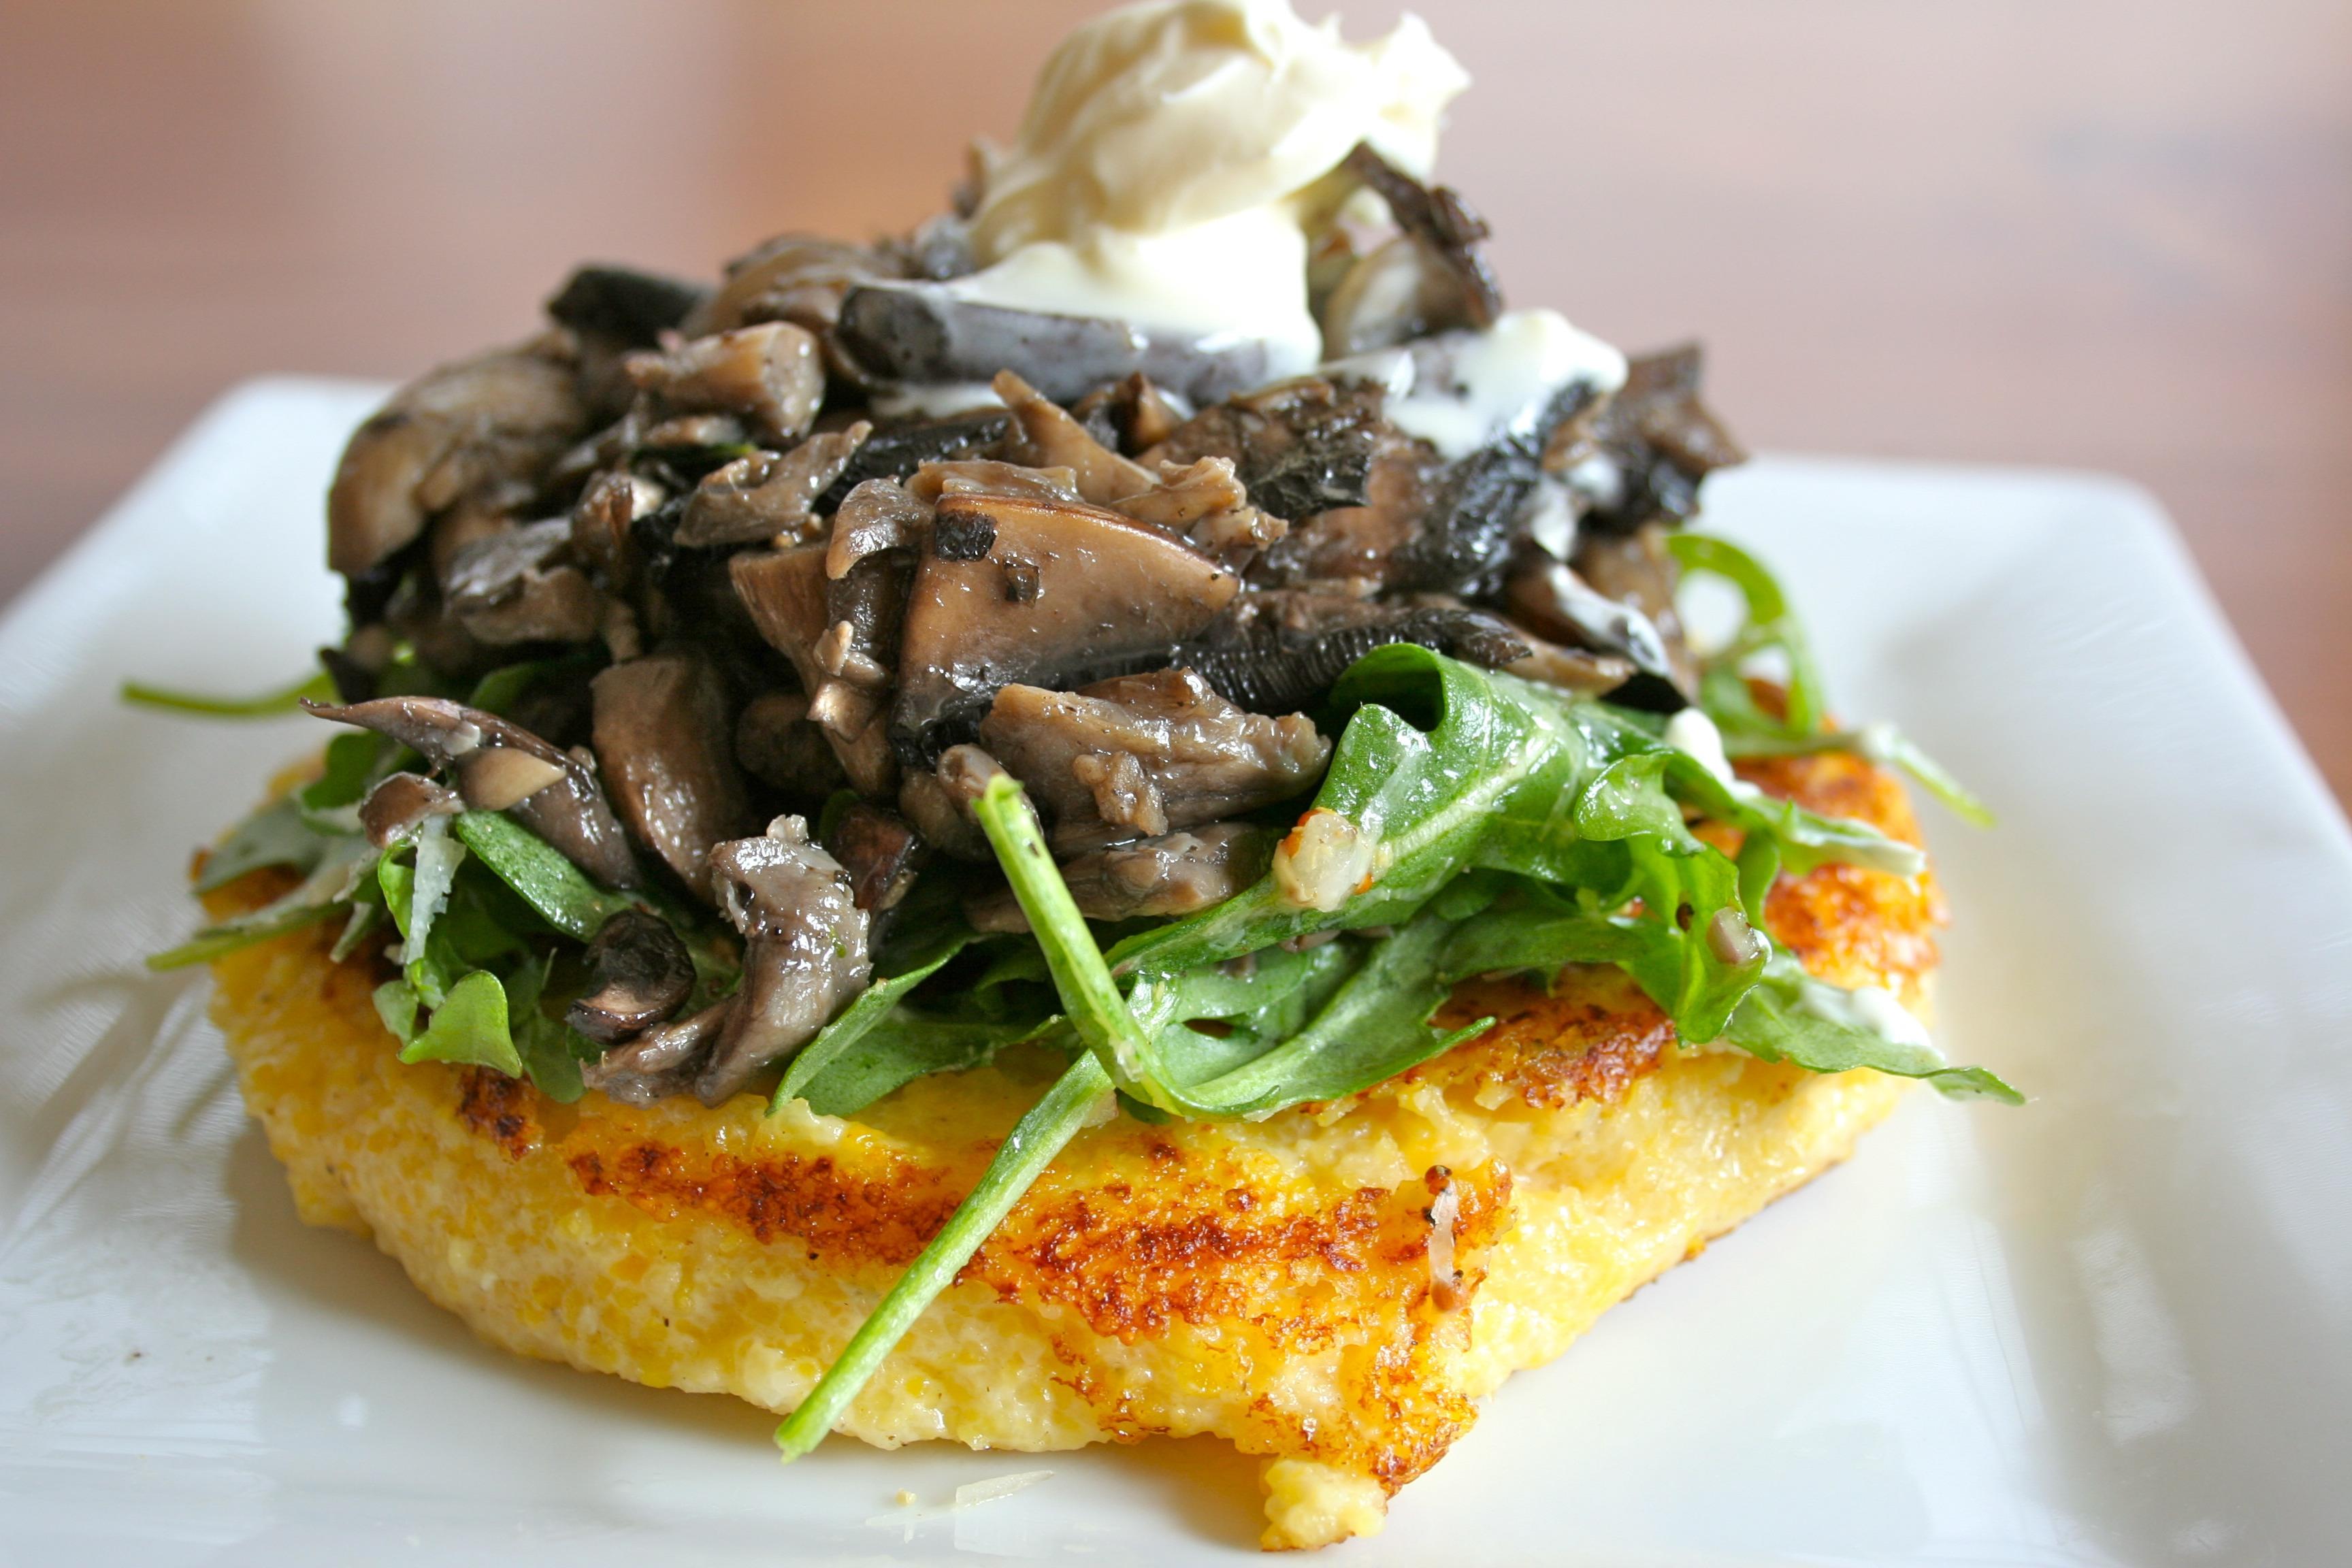 ... polenta wild mushrooms with their soft polenta with wild mushroom